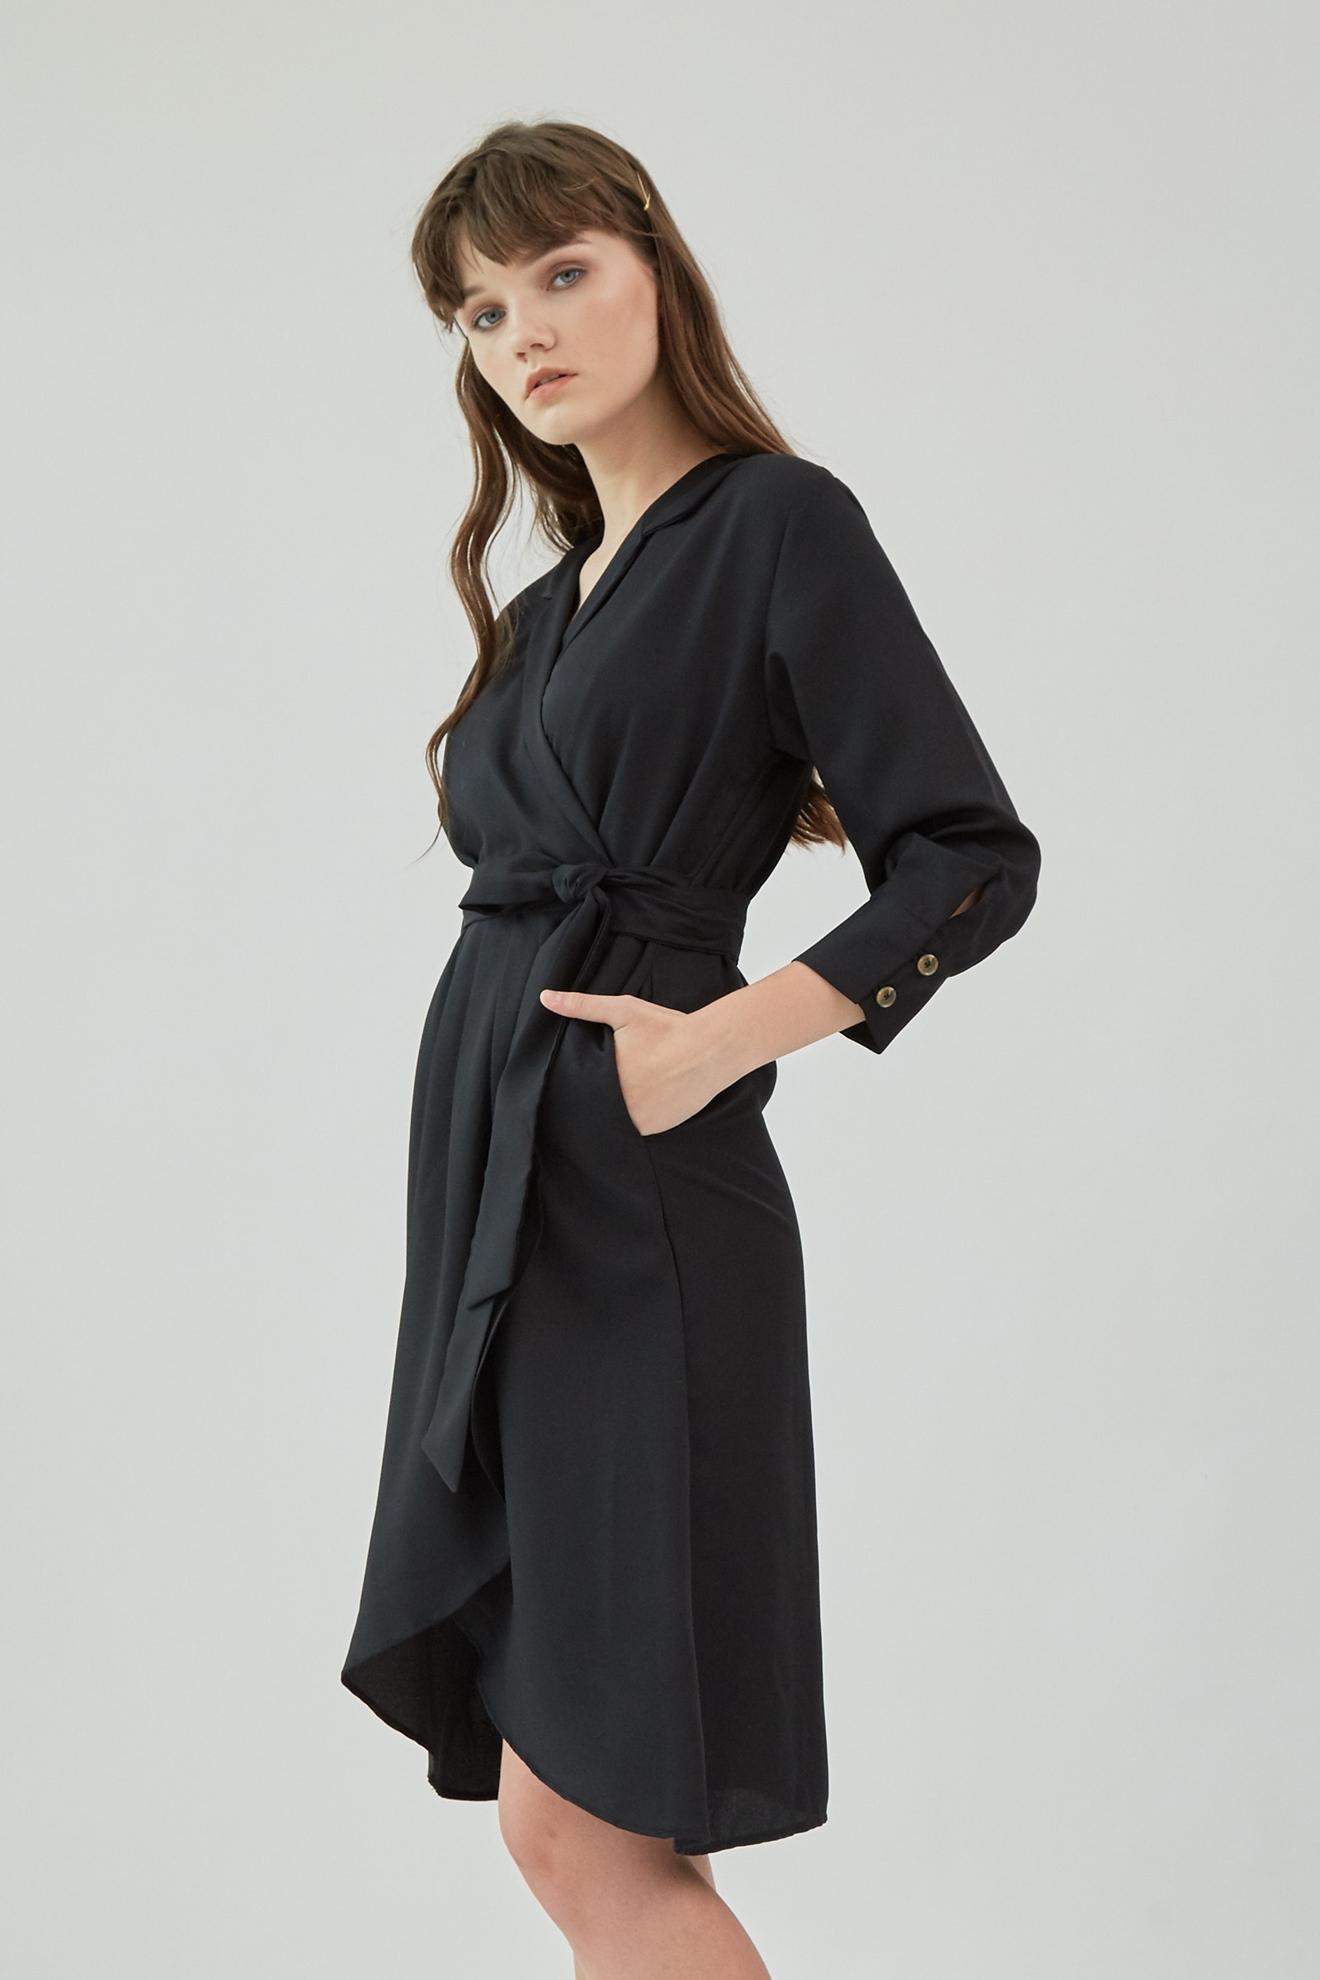 Picture of Delisa Dress Black